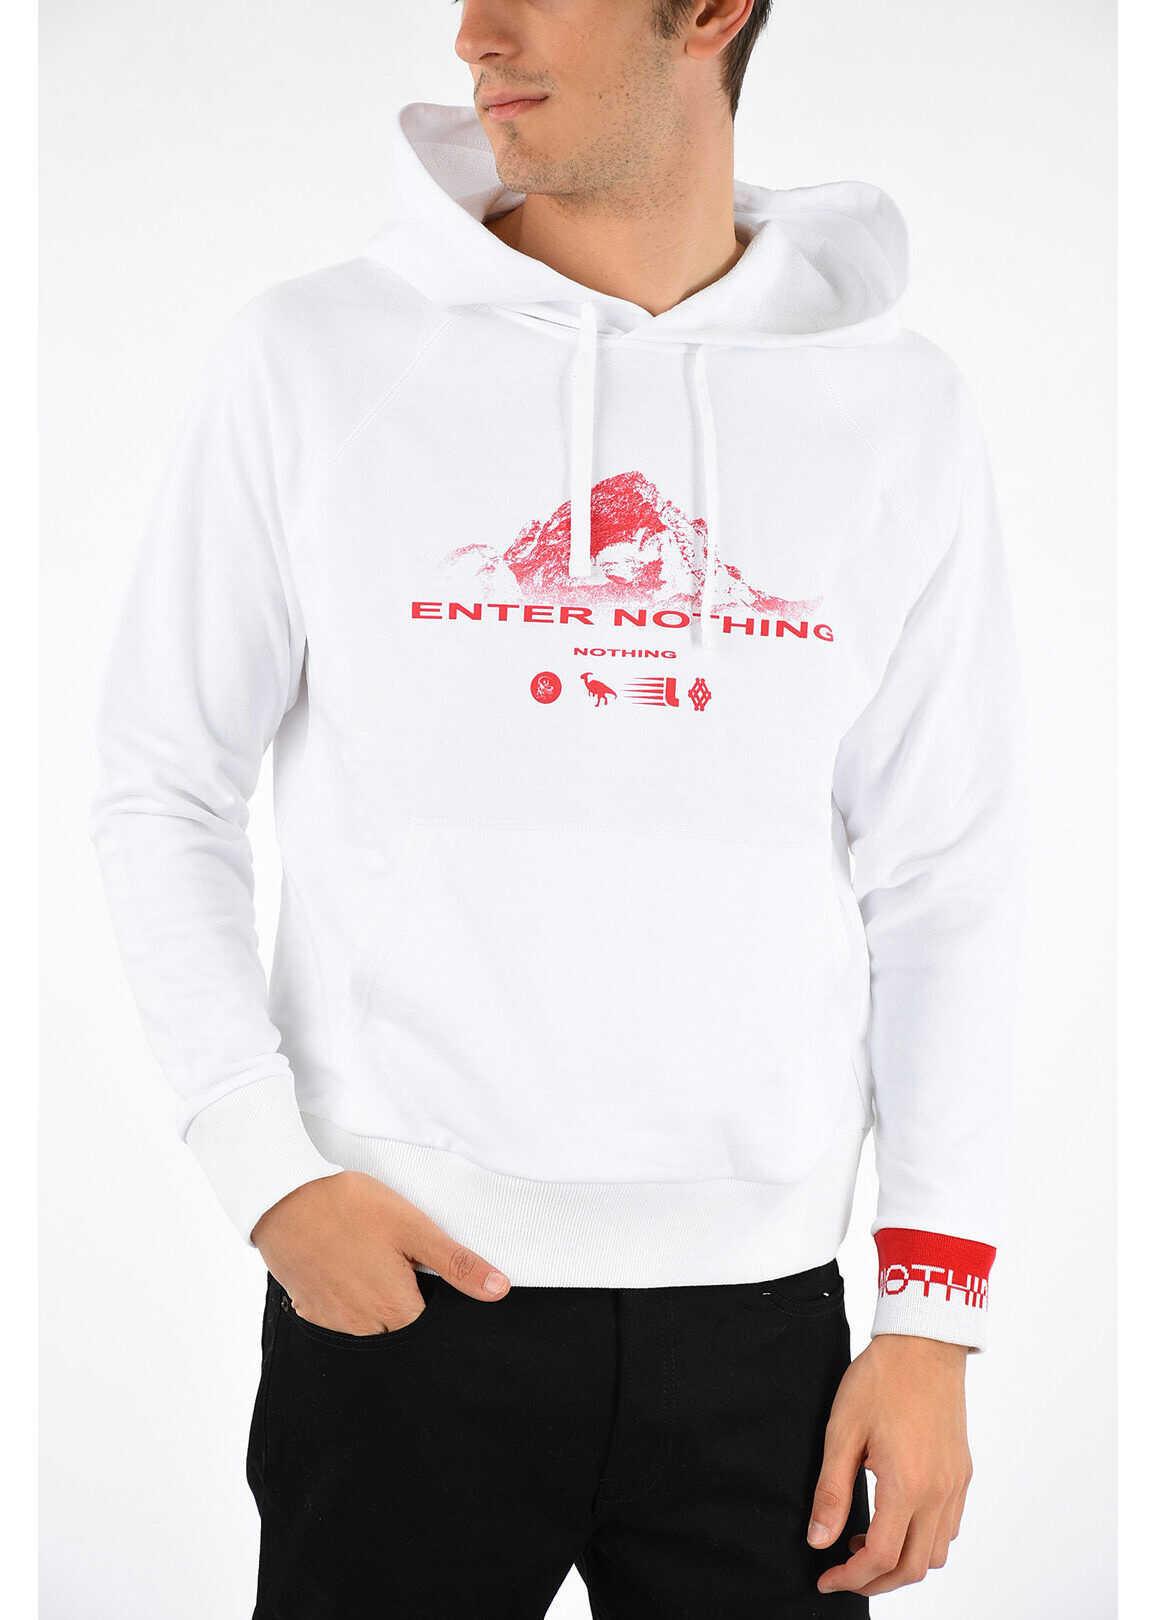 Lanvin Printed Sweatshirt WHITE